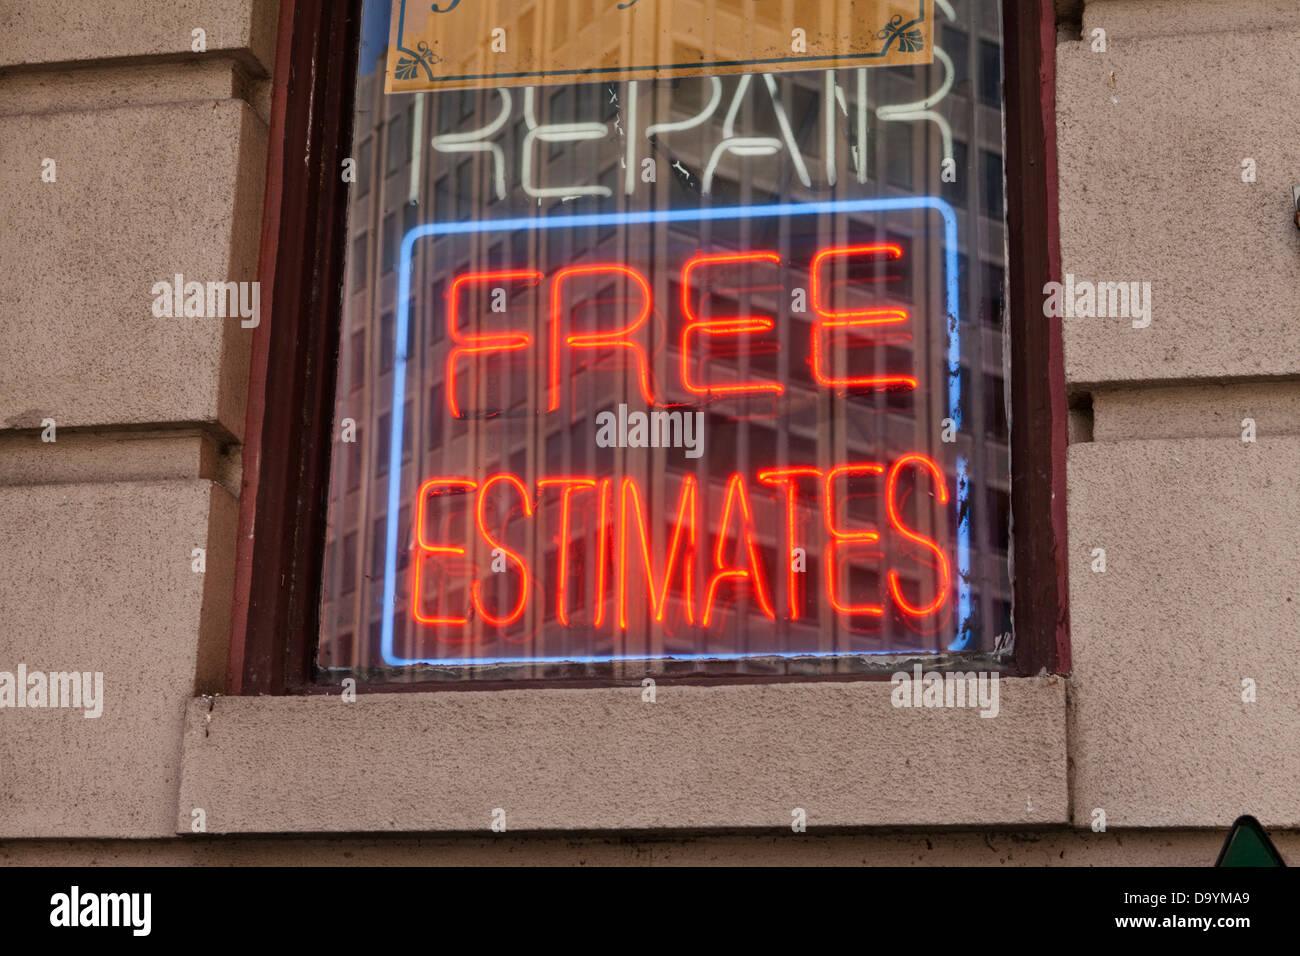 estimates neon sign stock photo royalty image  estimates neon sign